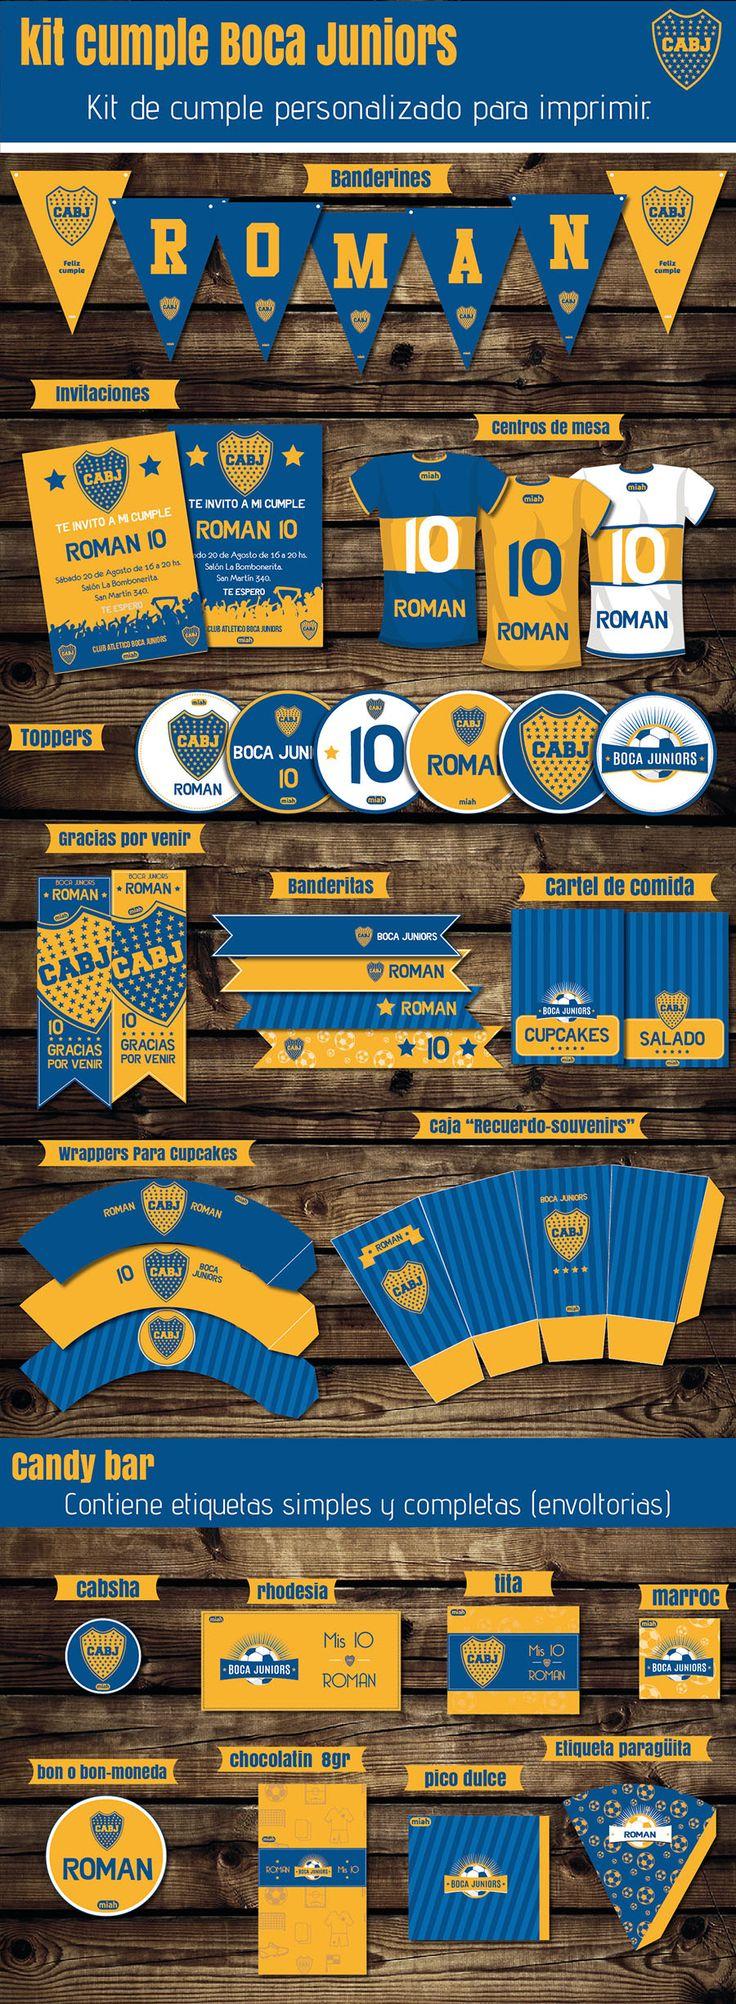 #kit #Boca #kitcumple #invitaciones #imprimible #kitimprimible #bocajuniors #lamitadmasuno #banderines #toppers #candybar #cumpleboca #cumpletematico #fiestacumple